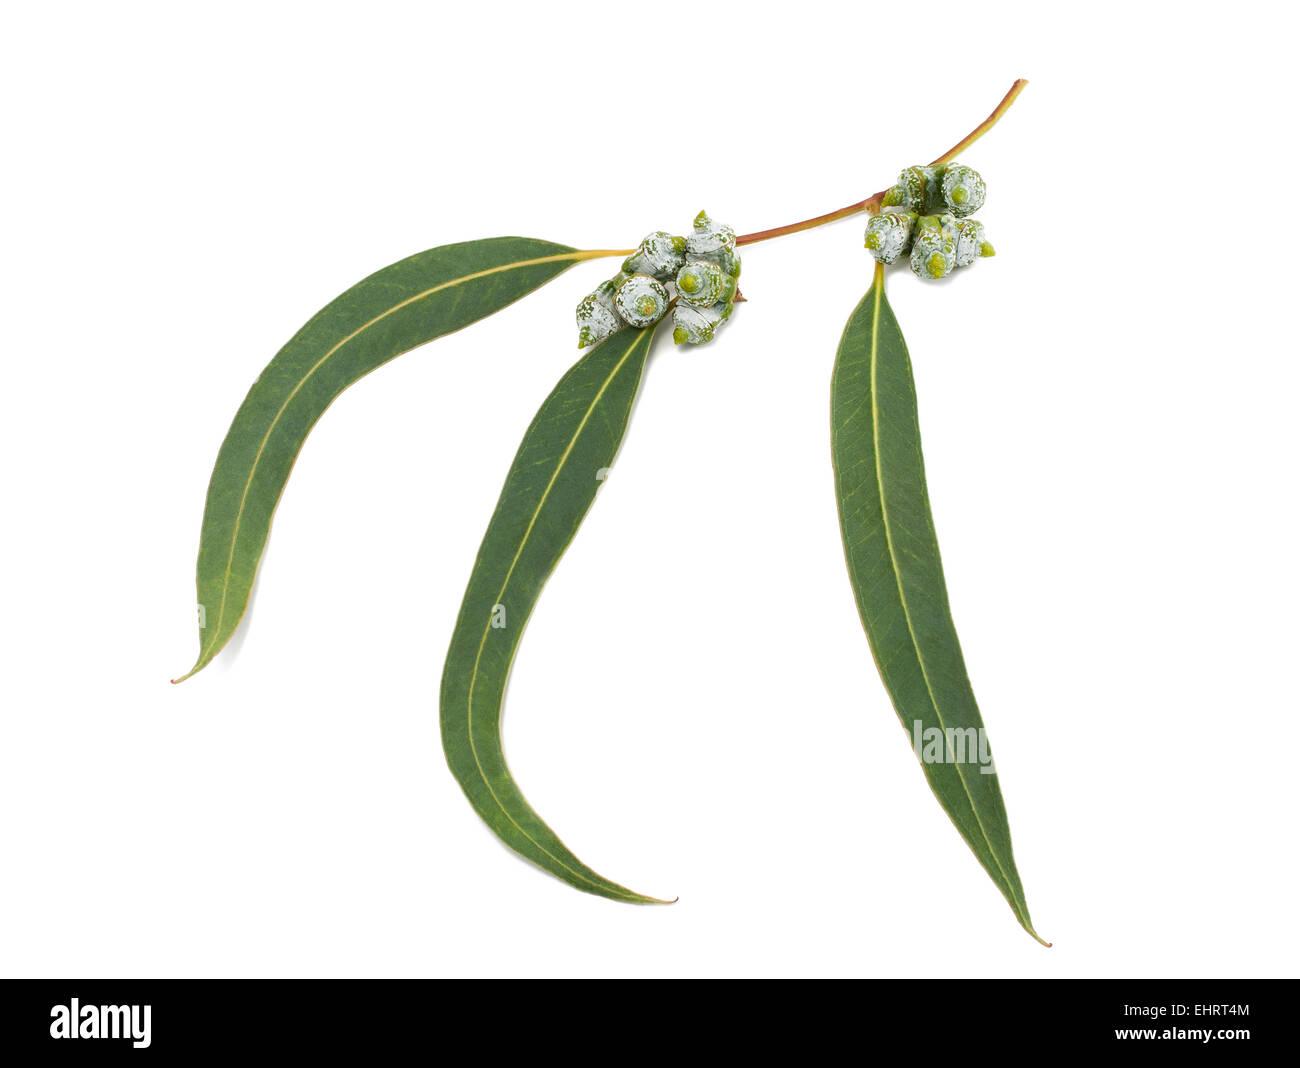 Eucalyptus branch isolated on white - Stock Image